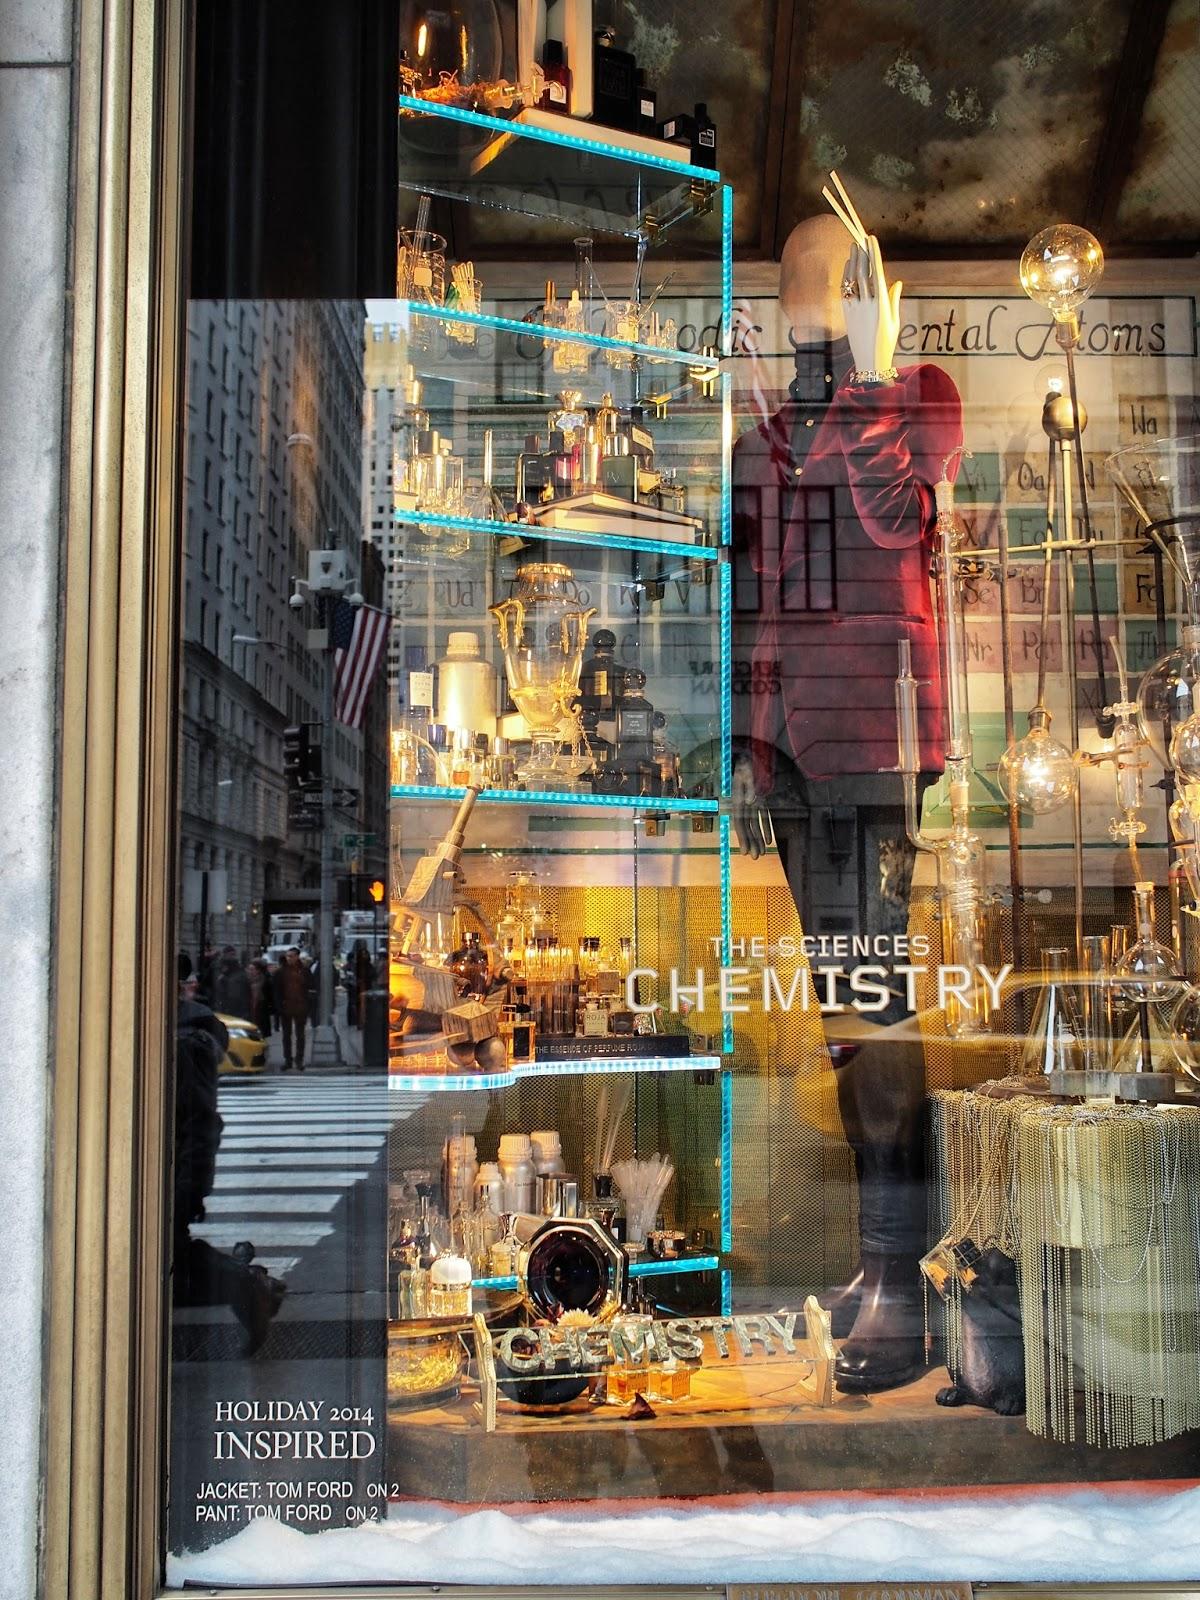 Inspired by Chemistry #inspiredbychemistry #bgwindows #windowwatchers #holidaywindows #5thavenuewindows #NYC  #holidays #besttimeoftheyear #nyc ©2014 Nancy Lundebjerg